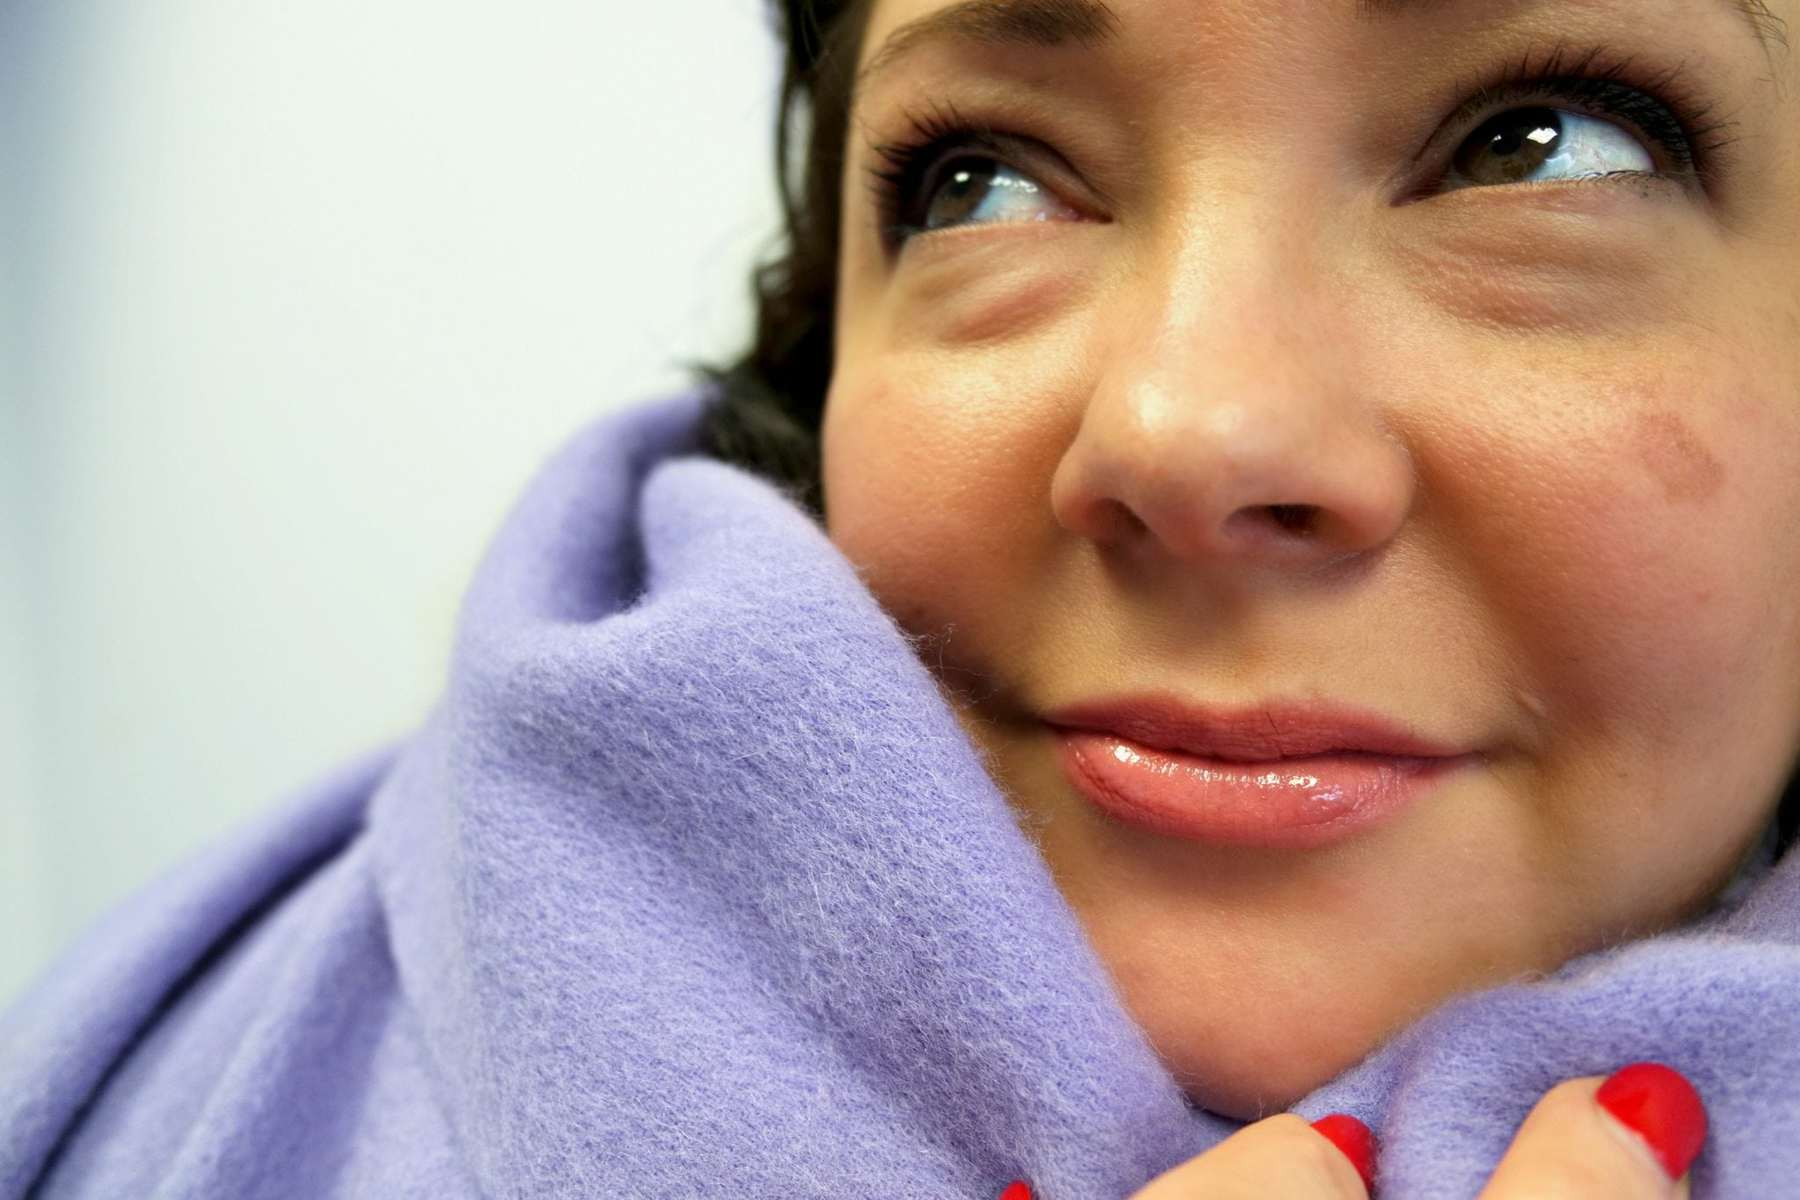 Wardrobe Oxygen Friday Favorite: Lambsool Shawl Pashmina from High Style via Amazon